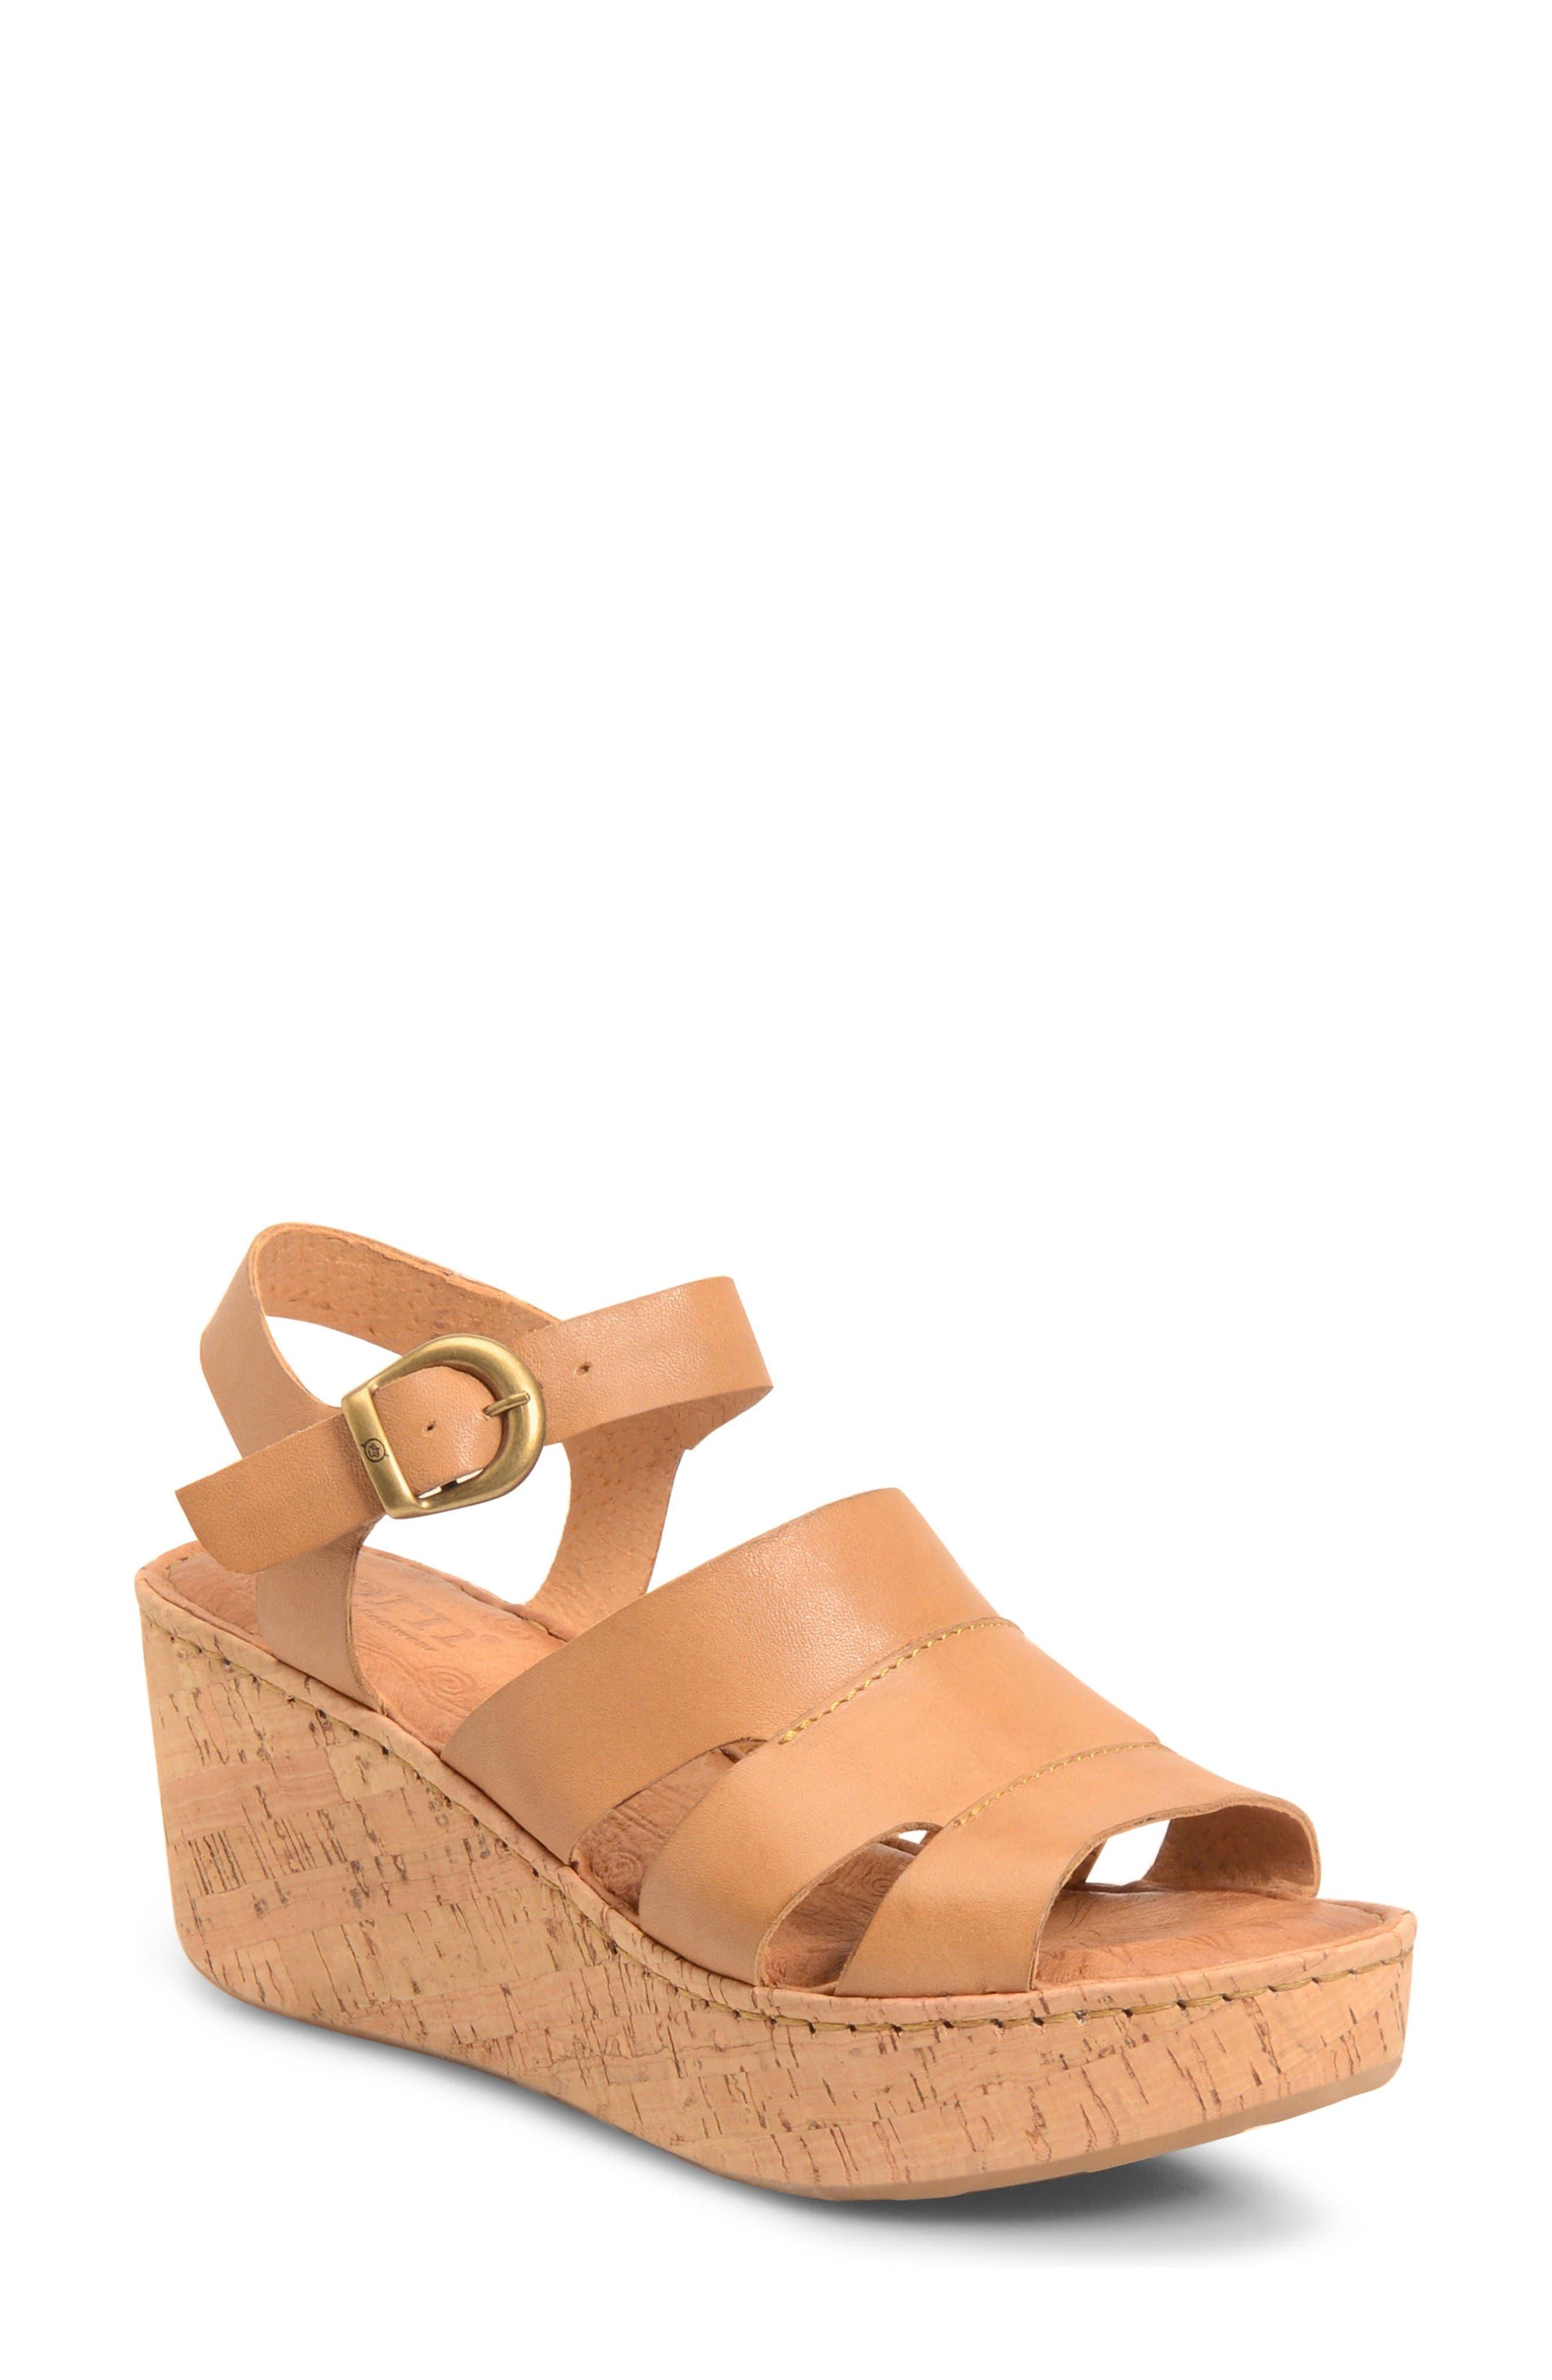 Main Image - Børn Anori Platform Wedge Sandal (Women)